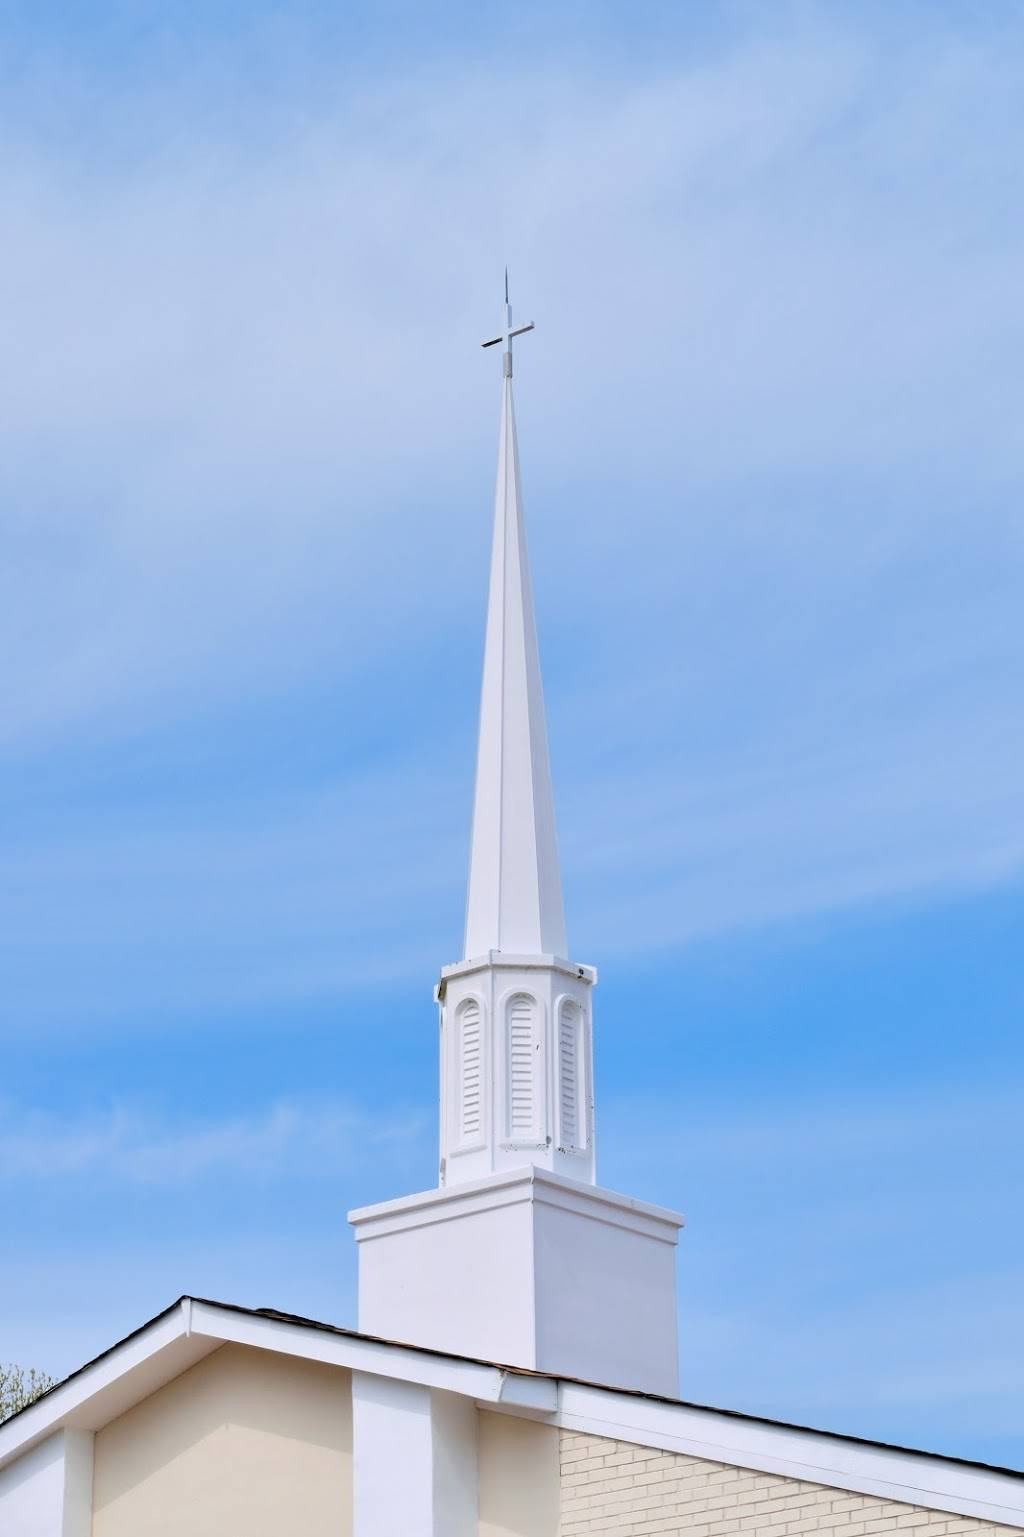 Rehoboth Baptist Church - church  | Photo 6 of 6 | Address: 182 S Birdneck Rd, Virginia Beach, VA 23451, USA | Phone: (757) 425-5225